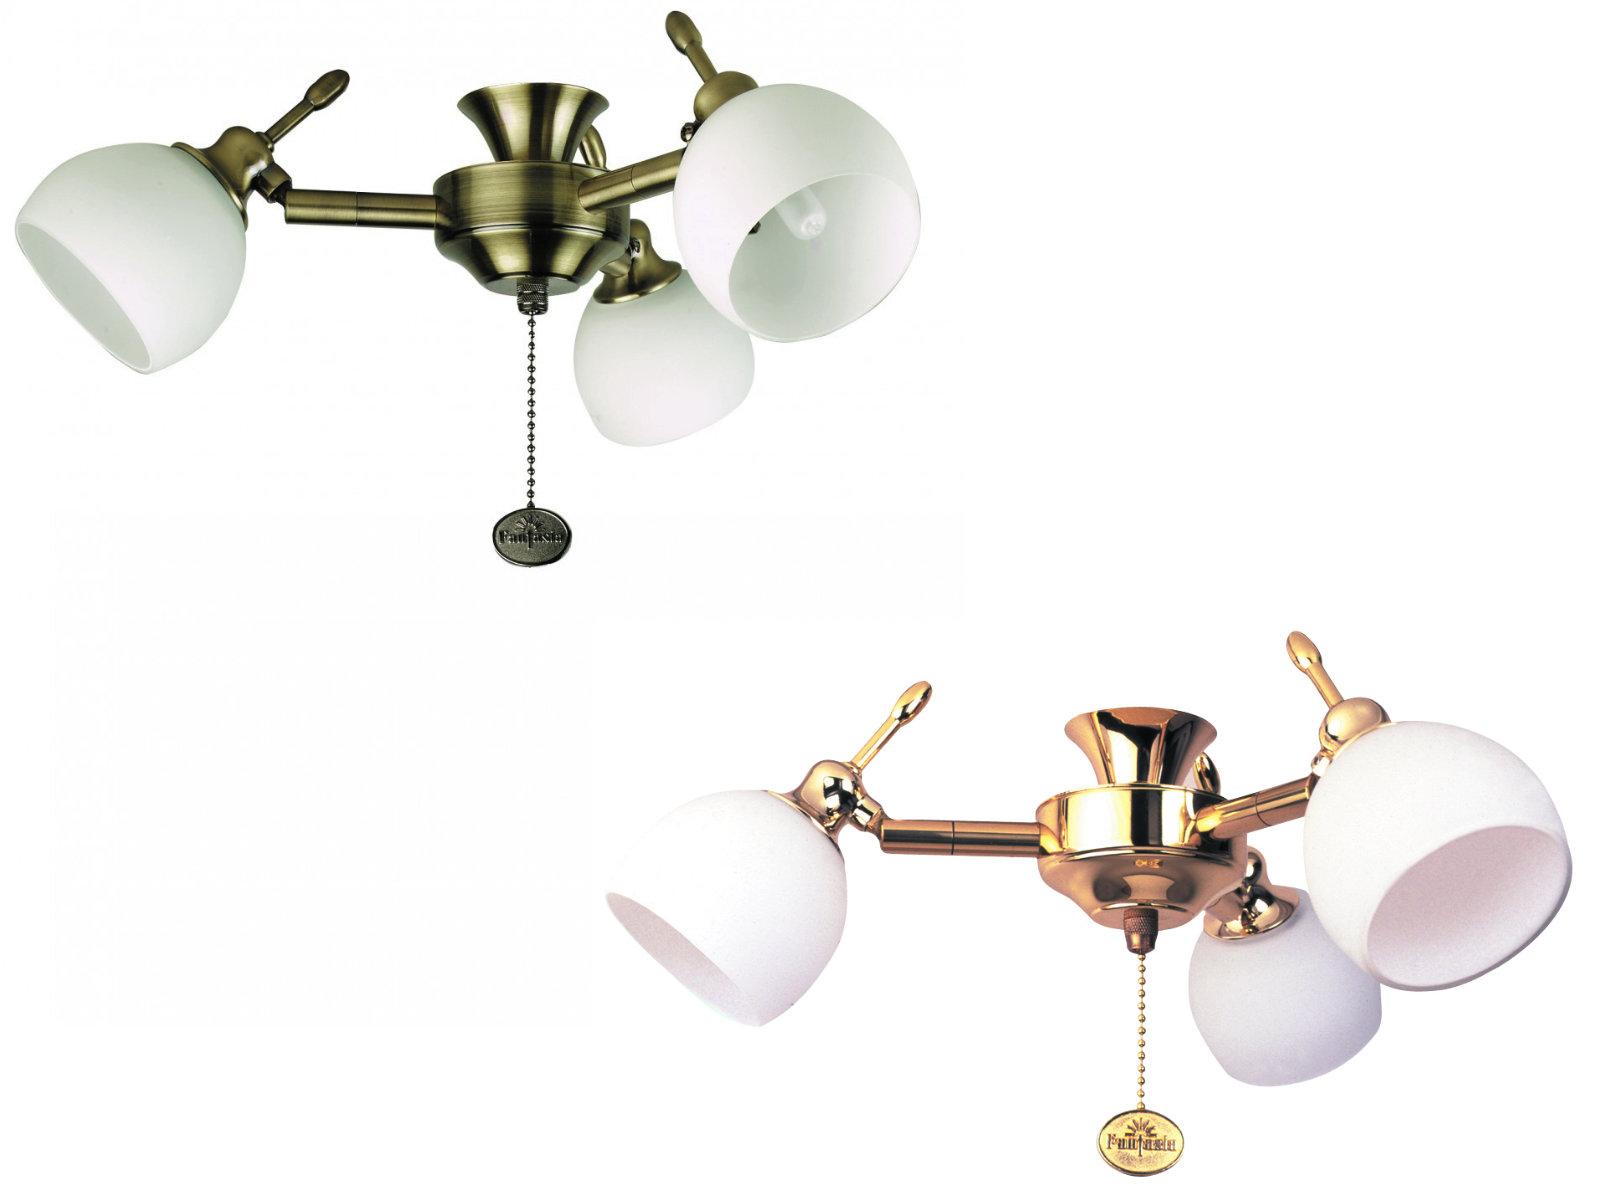 Fantasia Ceiling Fan Add On Light Kit Florence Ceiling